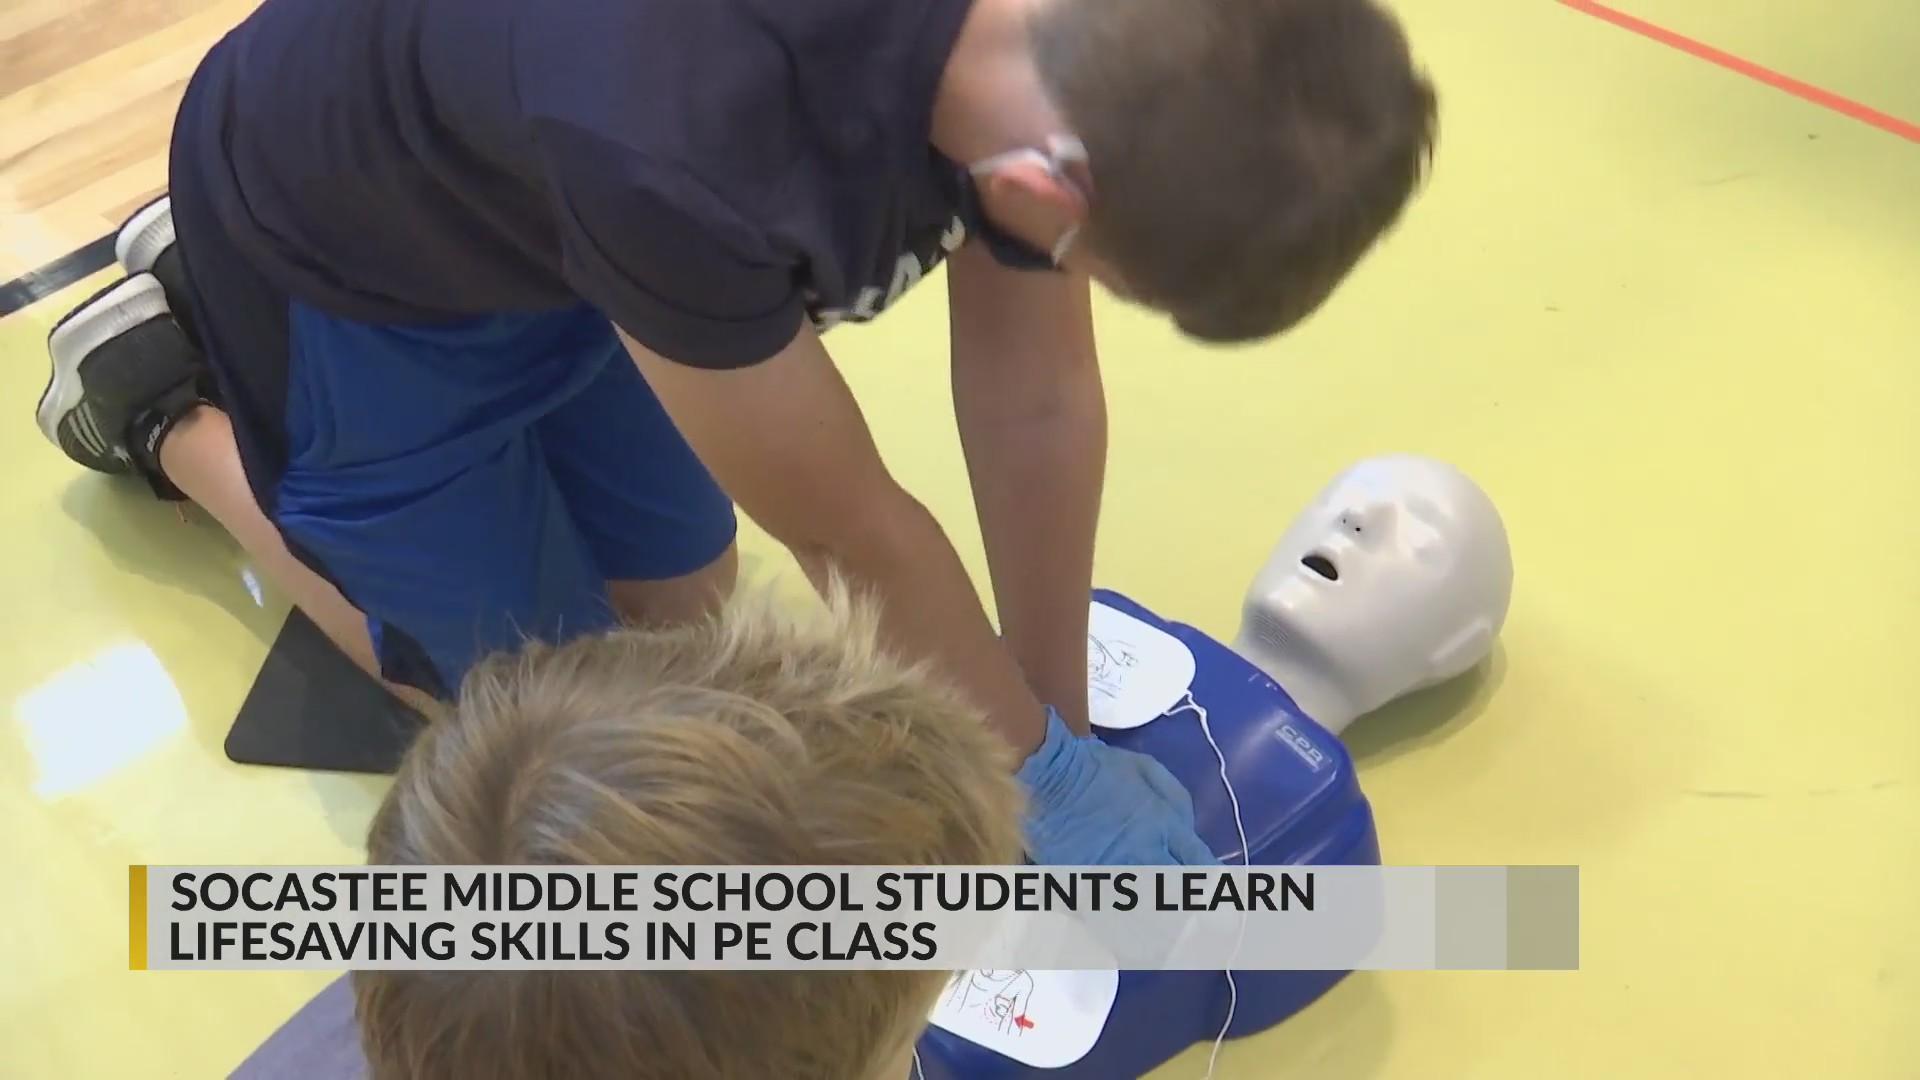 Middle school students get life-saving skills training